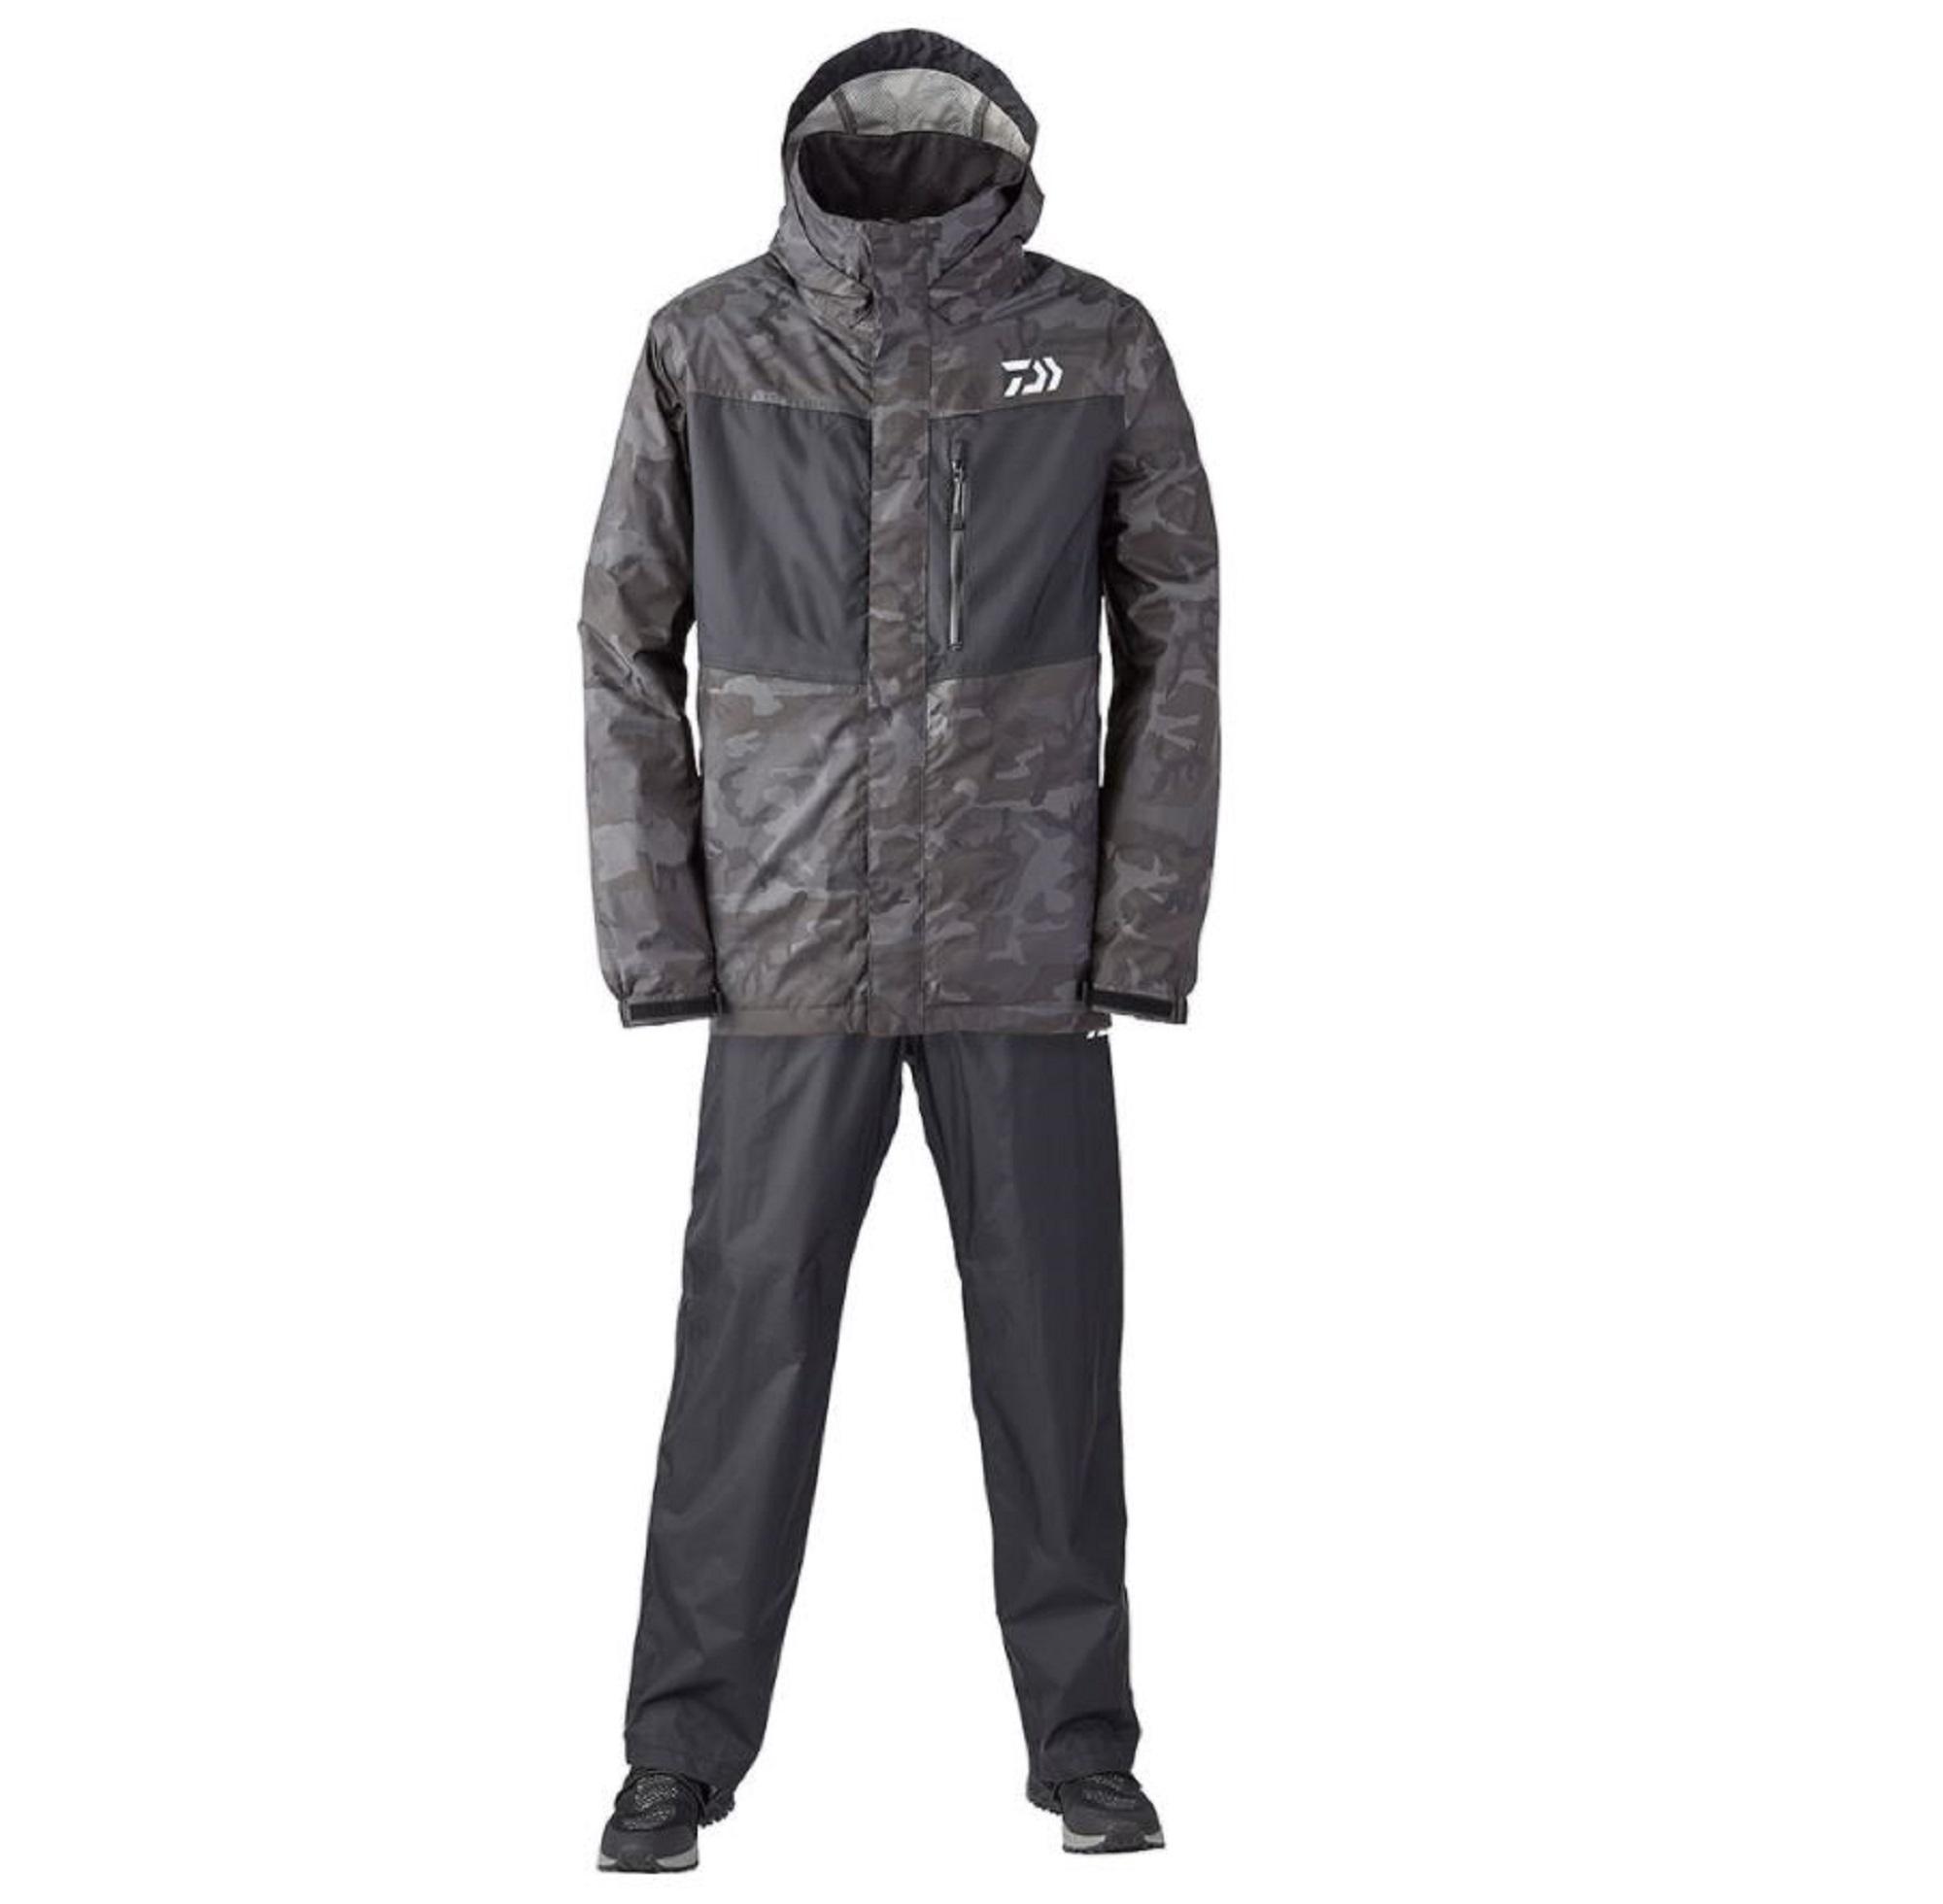 Daiwa DR-3621 Rainmax Water Repellent Jacket Size S Black Camo (6275)